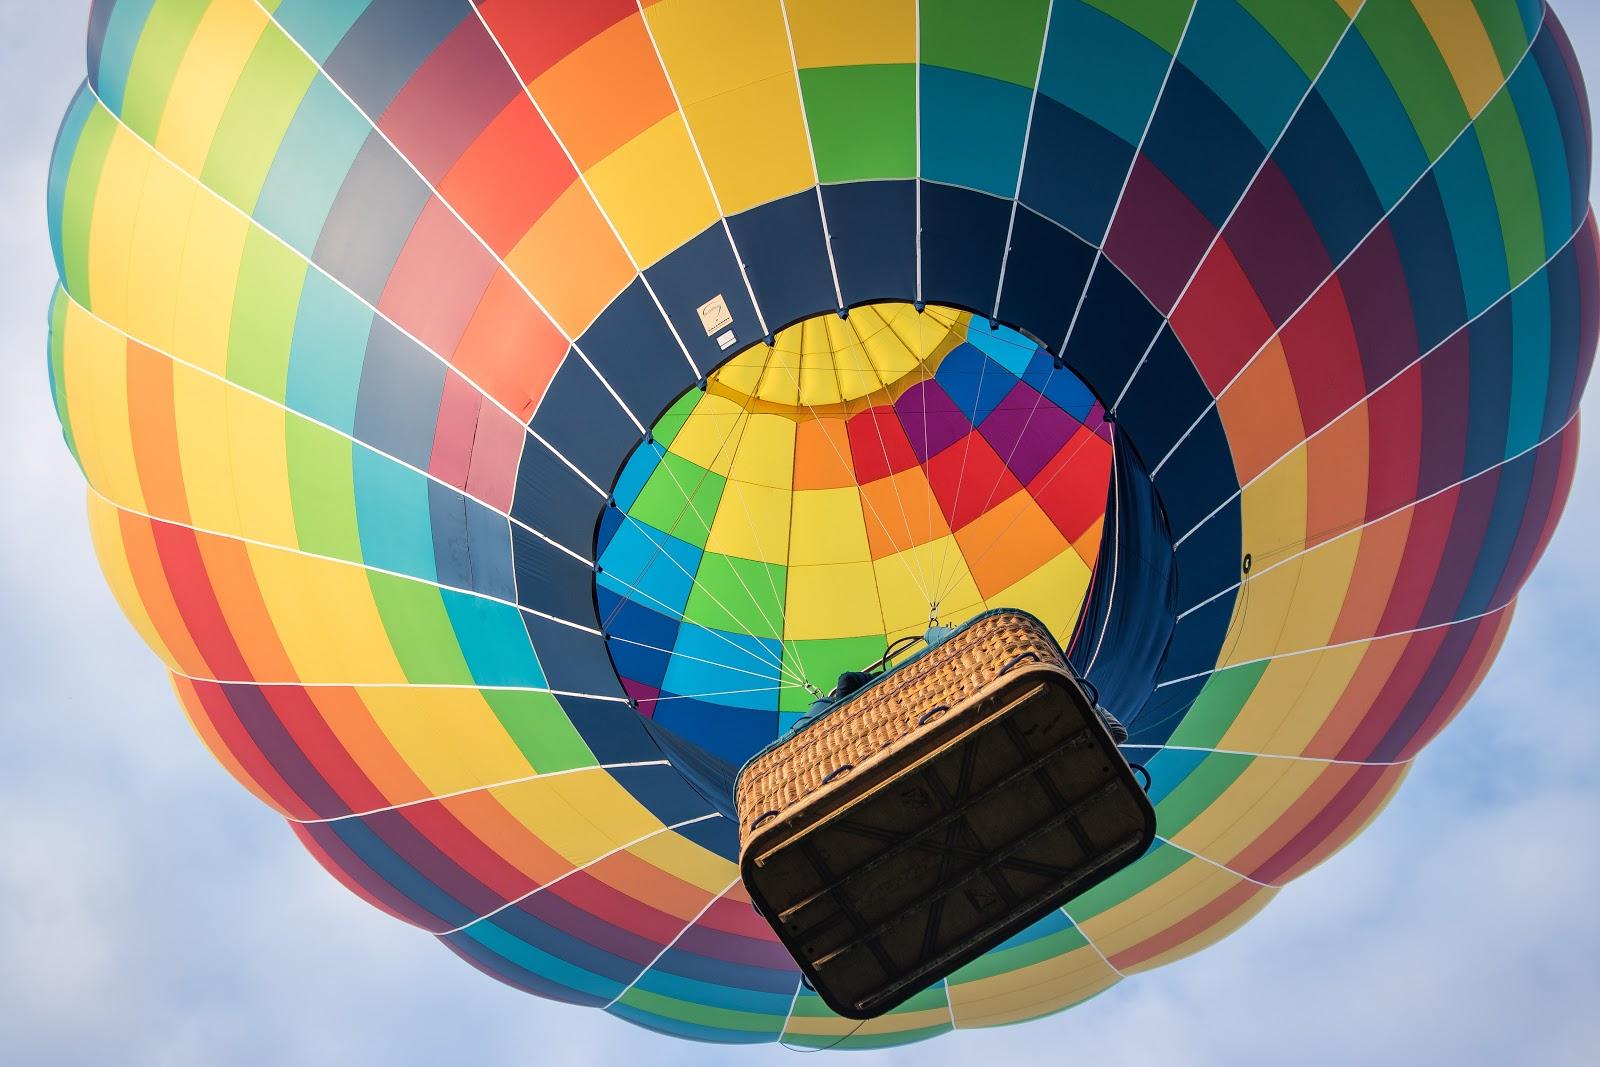 Hot air balloon, balloon basket, ascension day,